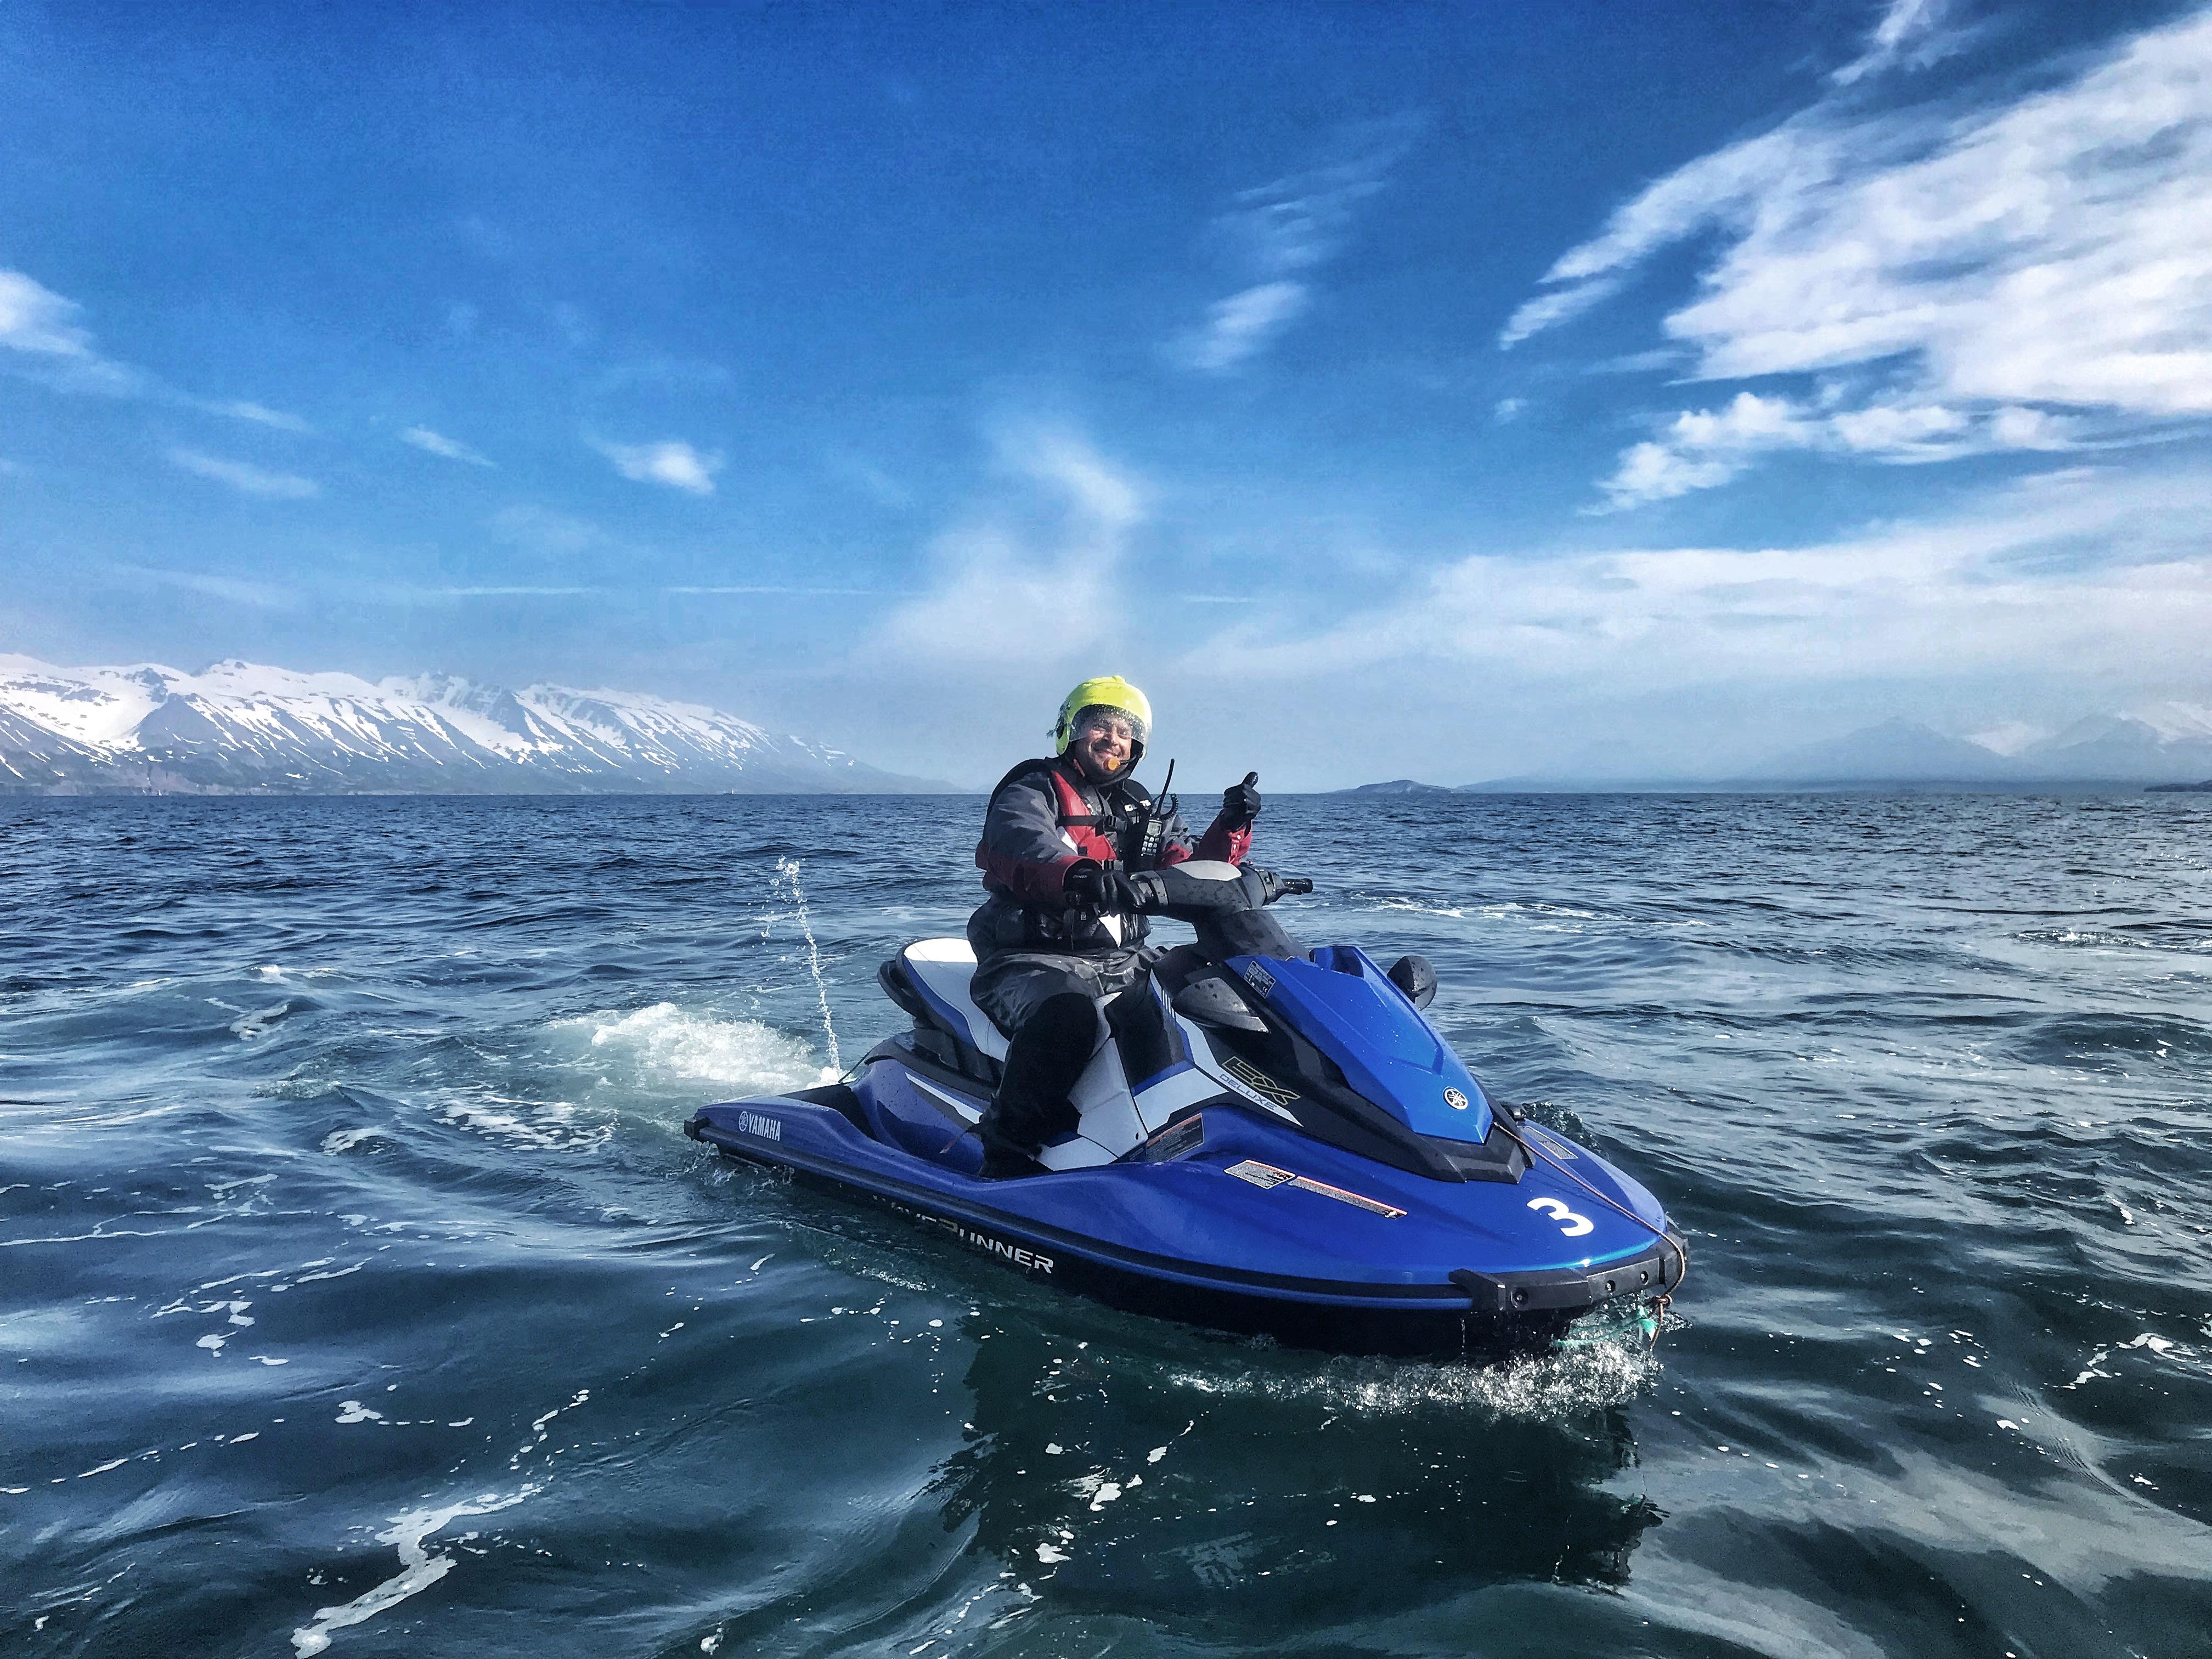 Jet skiing in Iceland near the town and fjord of Ólafsfjörður